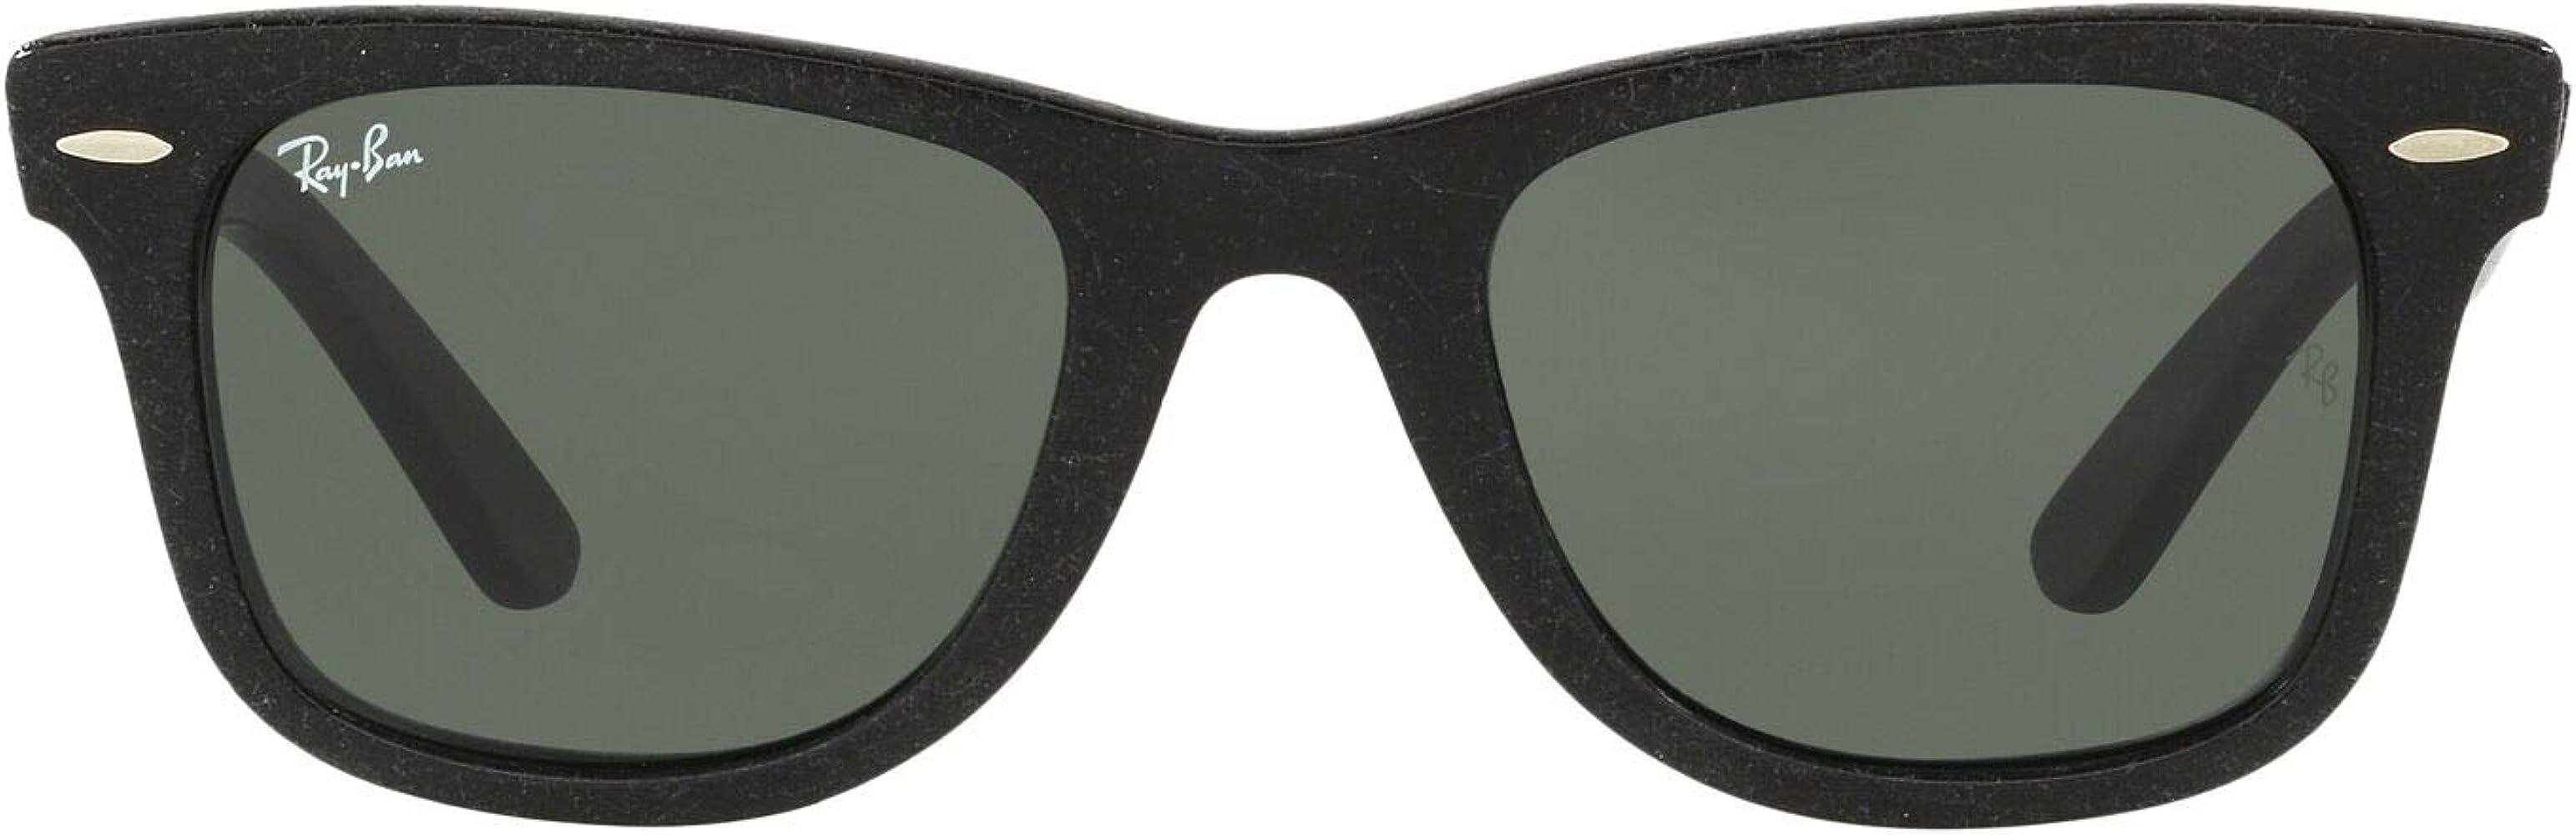 Ray-Ban Wayfarer, Gafas de Sol Unisex, Negro (Distressed Black / Green Classic G-15, 50 mm: Amazon.es: Deportes y aire libre